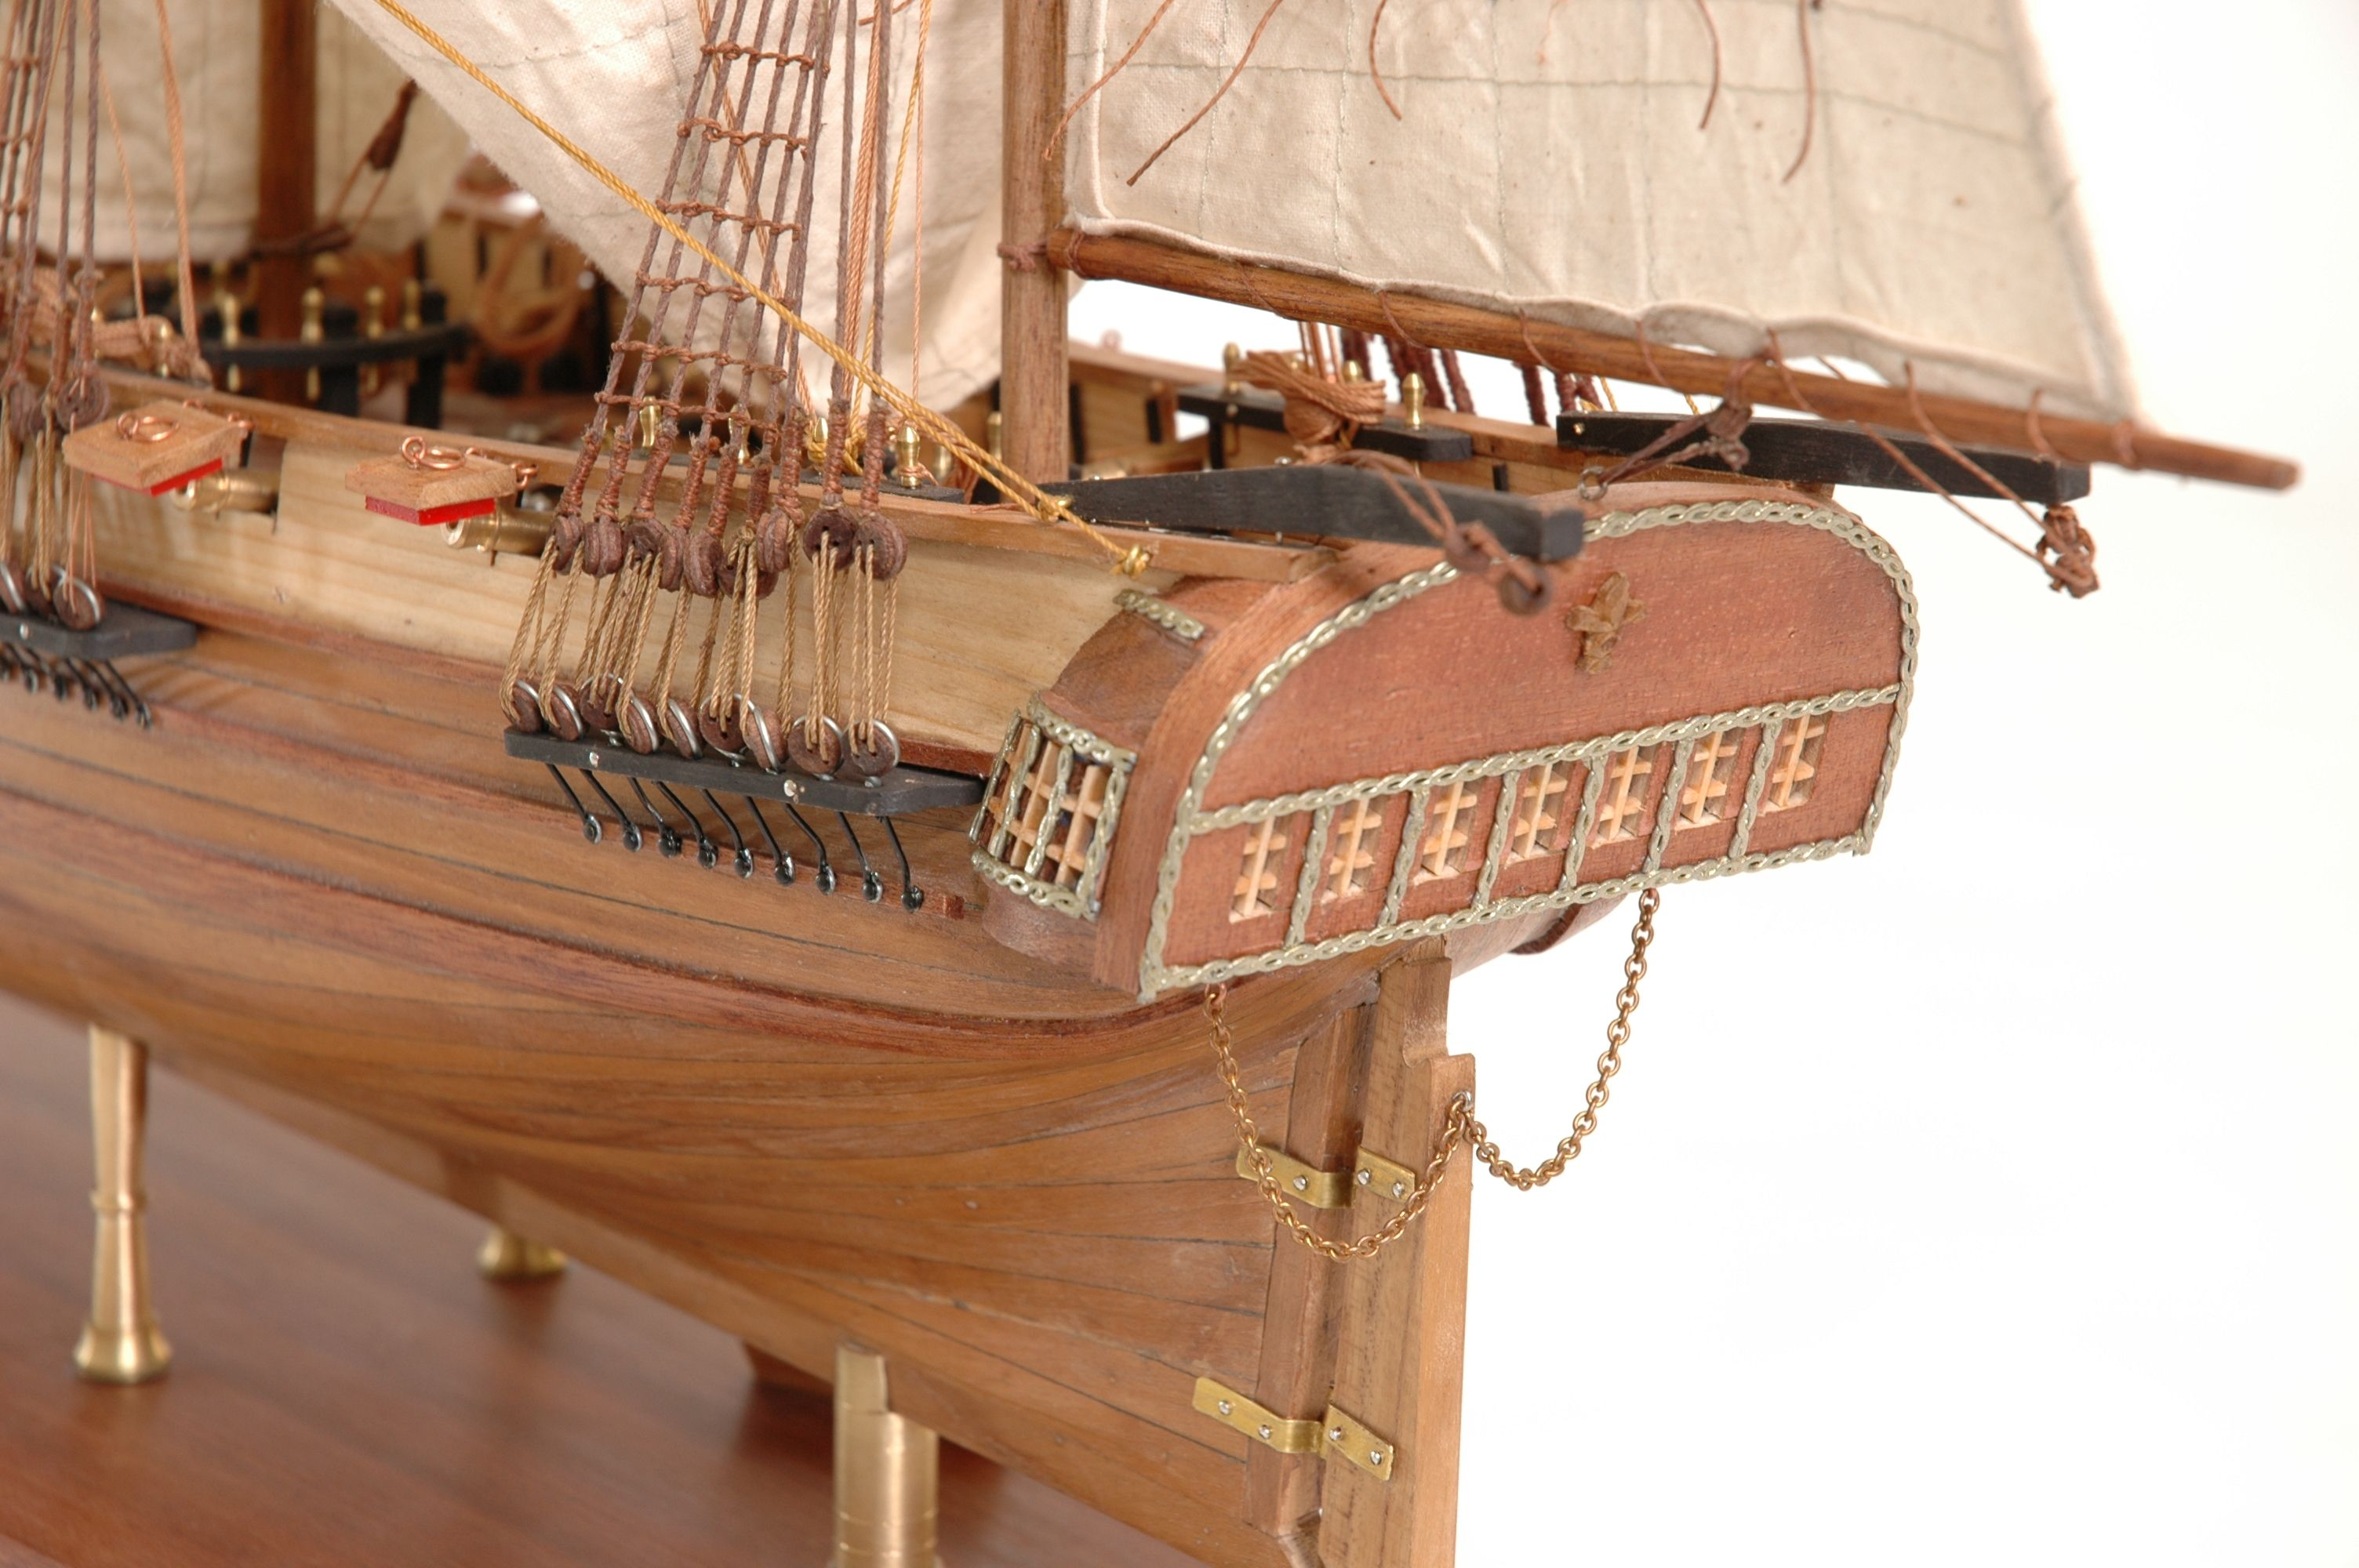 144-7848-Astrolabe-Model-Ship-Superior